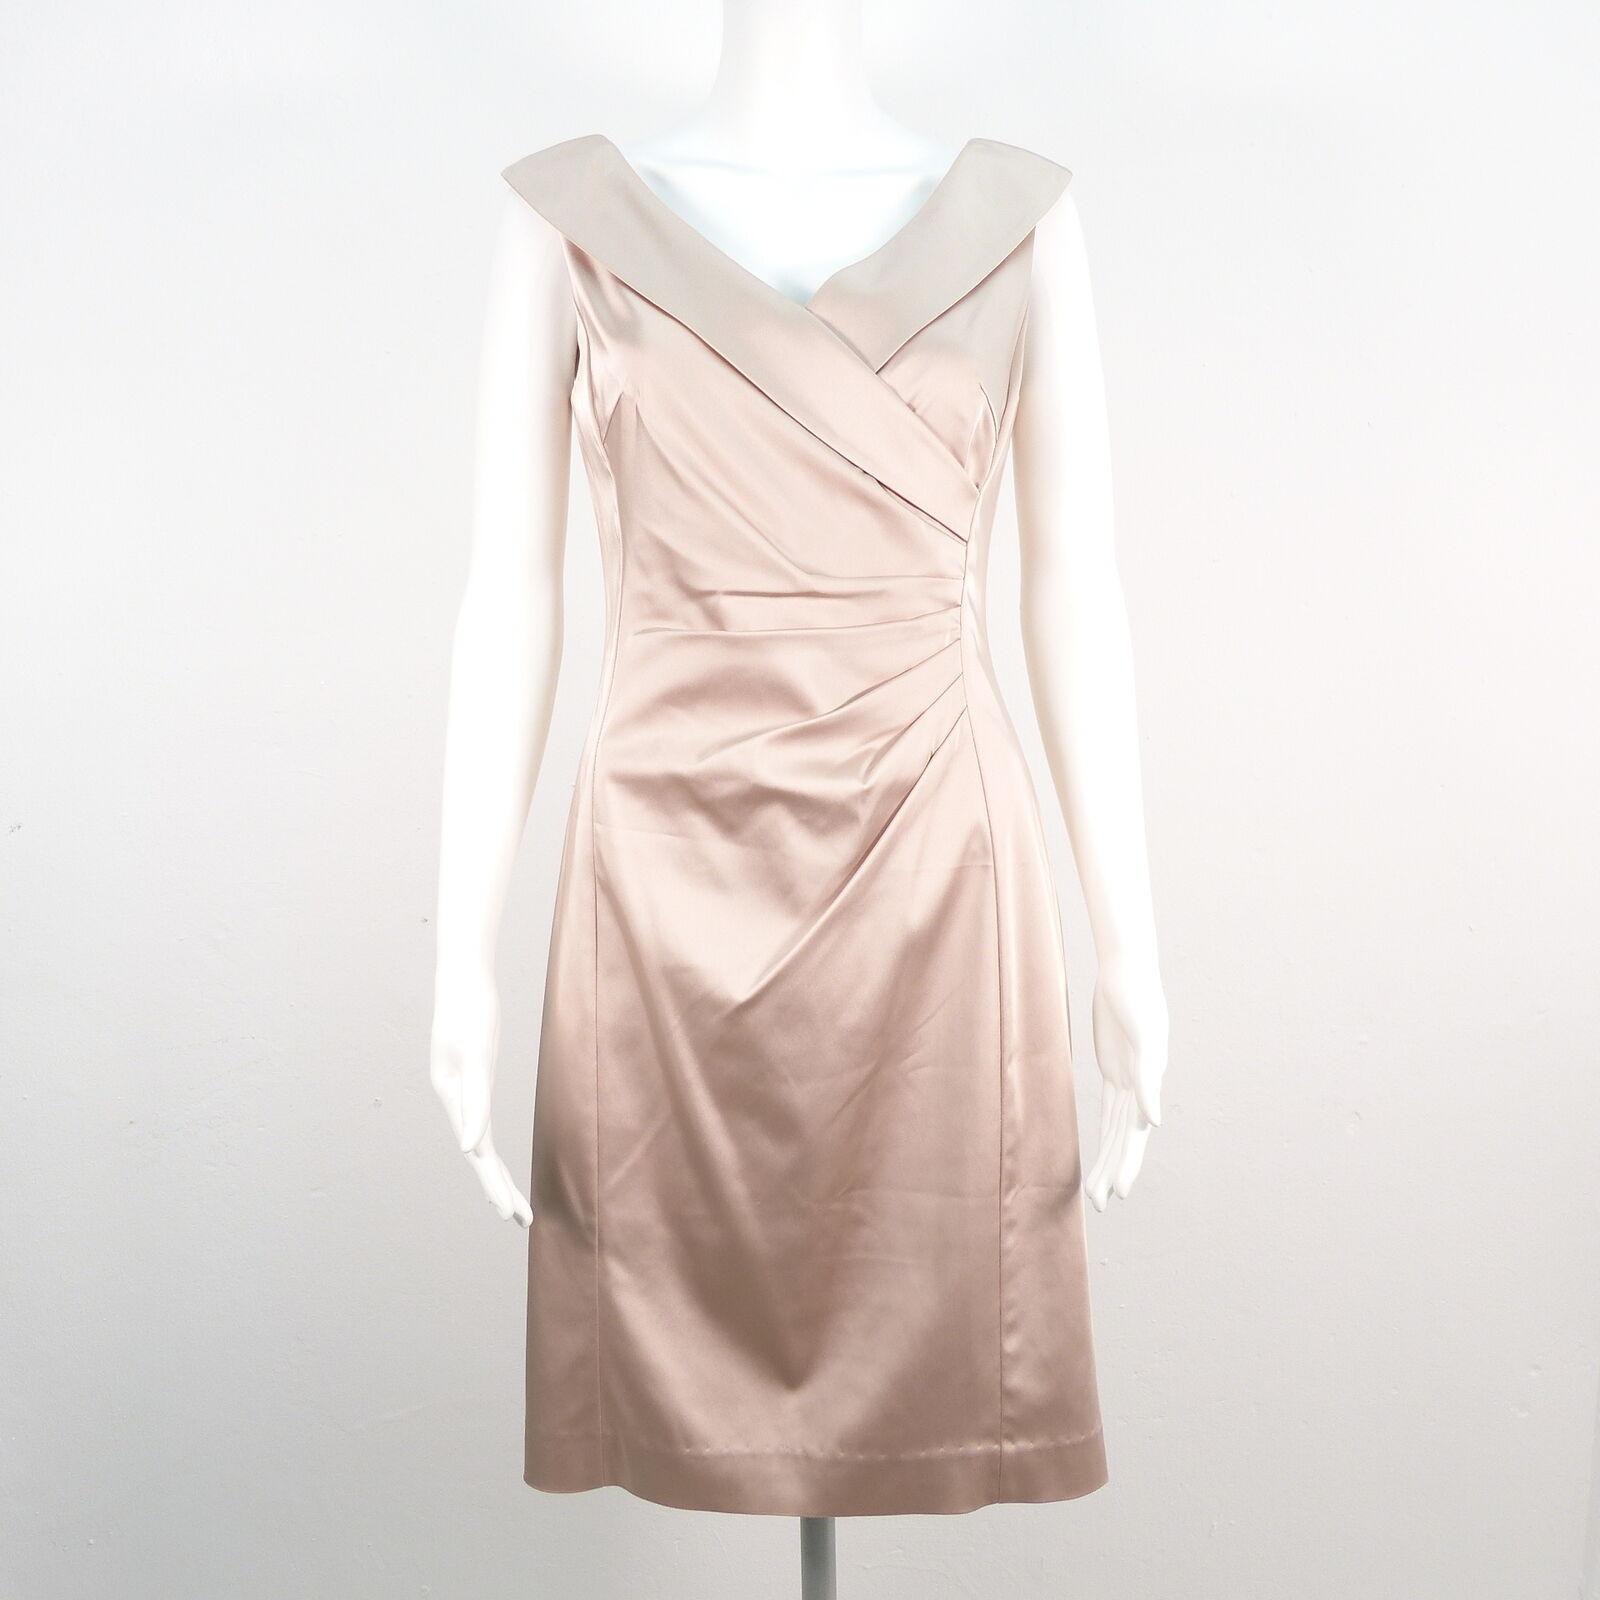 Christian Berg Abito Da Cocktail Tg It 36 rosa donna stretch satin dress robe